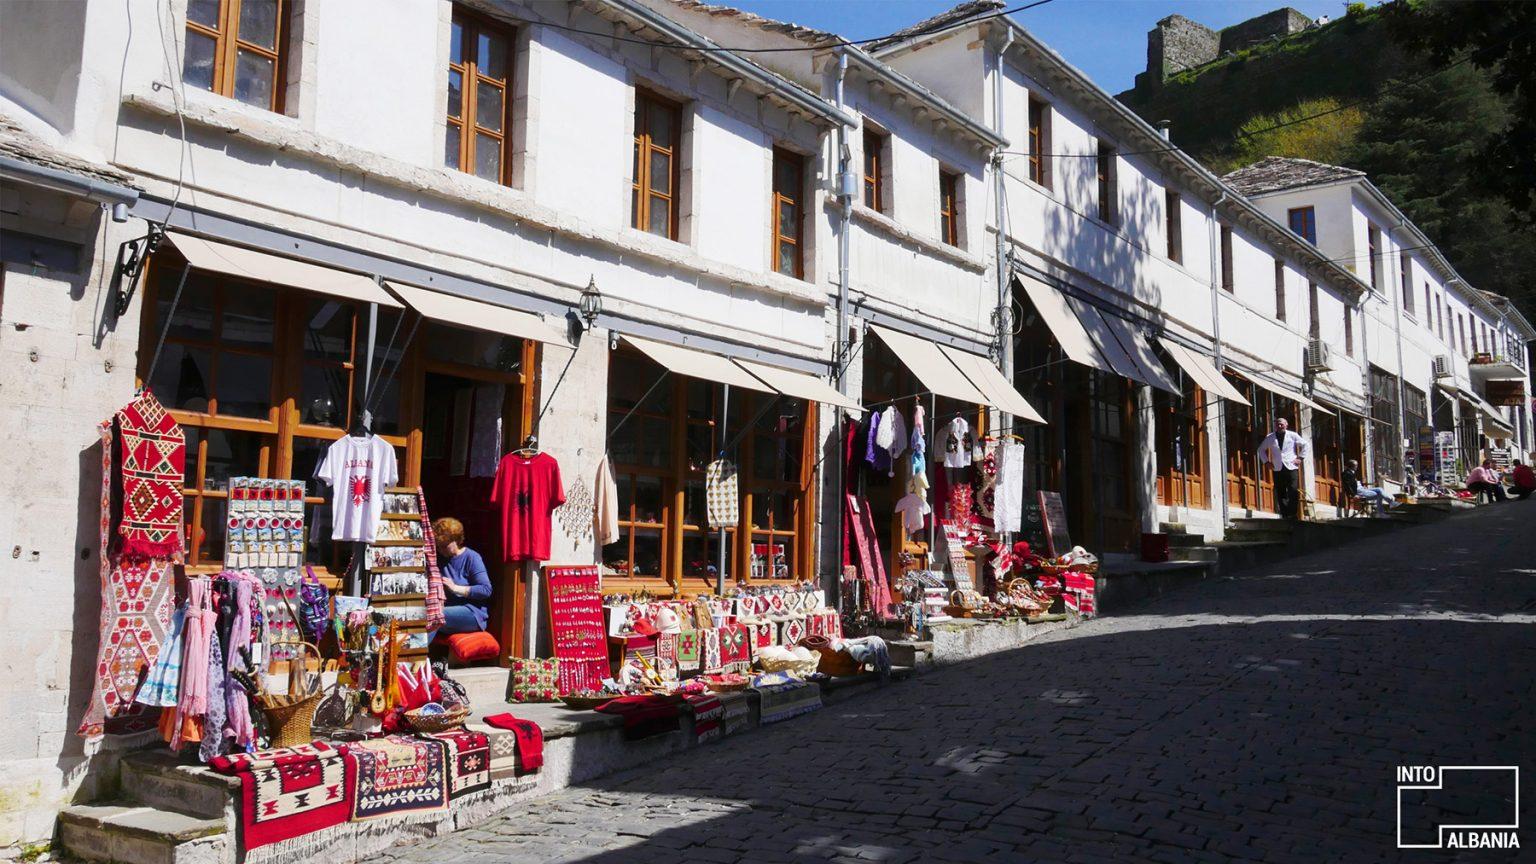 Pazari i Gjirokastrës, foto nga IntoAlbania